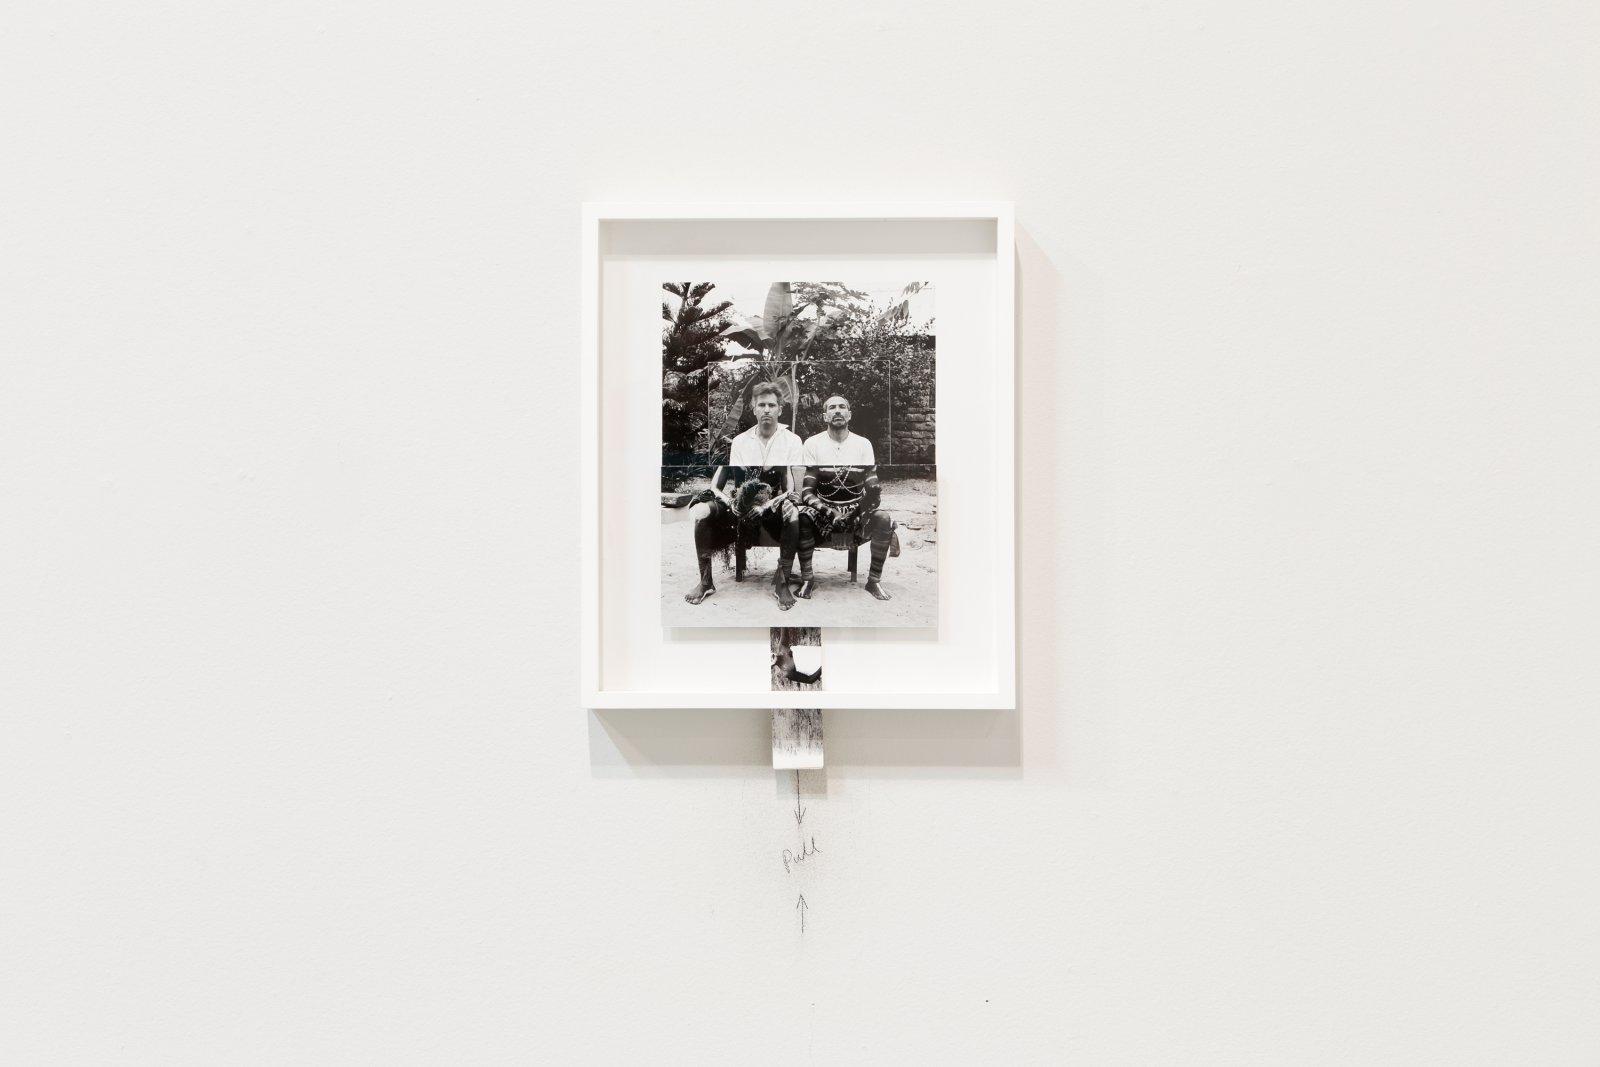 Nudniks, 2012 © Adam Broomberg & Oliver Chanarin / Everything Was Beautiful and Nothing Hurt,  FoMu, Antwerp, 2014, Installation View © Lukas Verdijk & Vesna Faassen